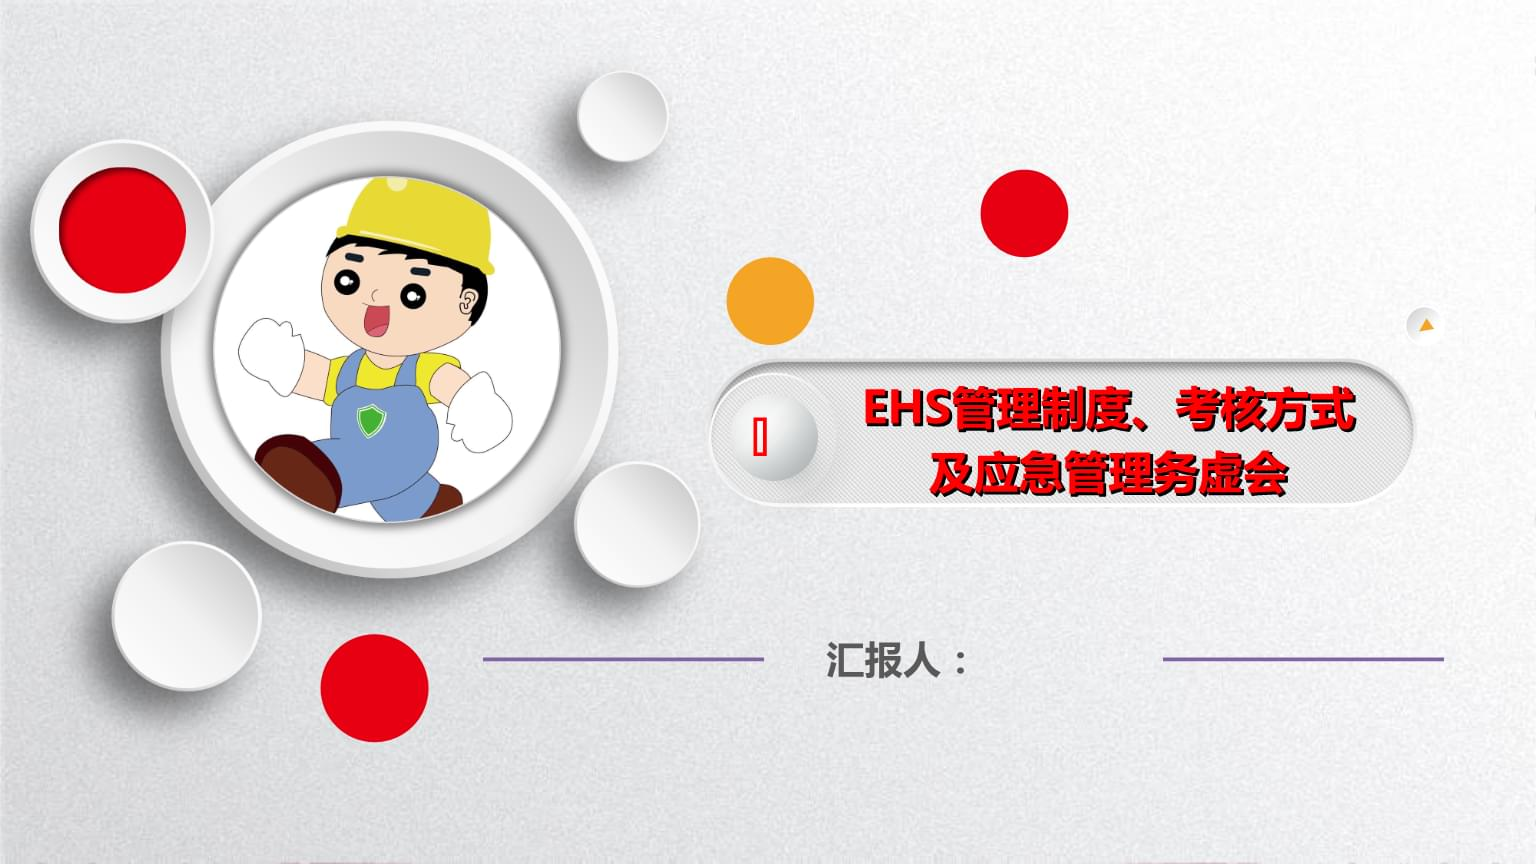 EHS工作务虚会学习.ppt